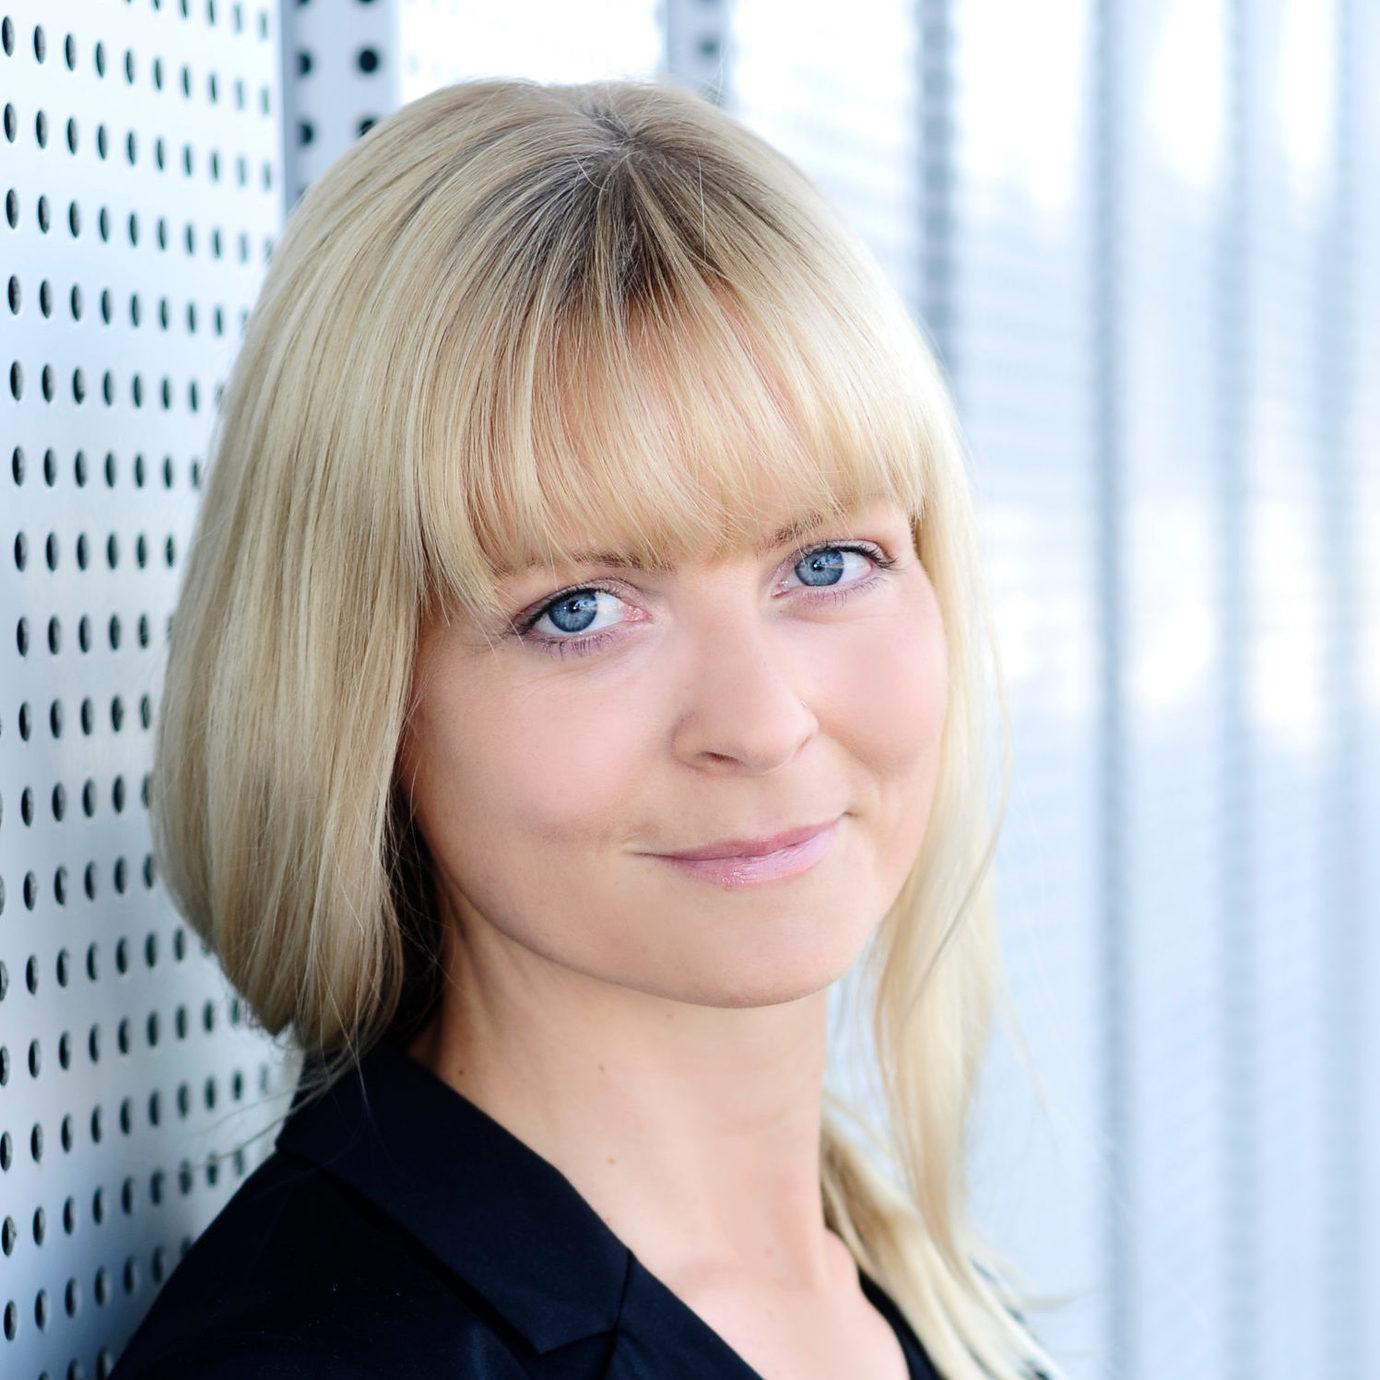 Kundenstimmen Grafiksoftware; Sylvia Leister